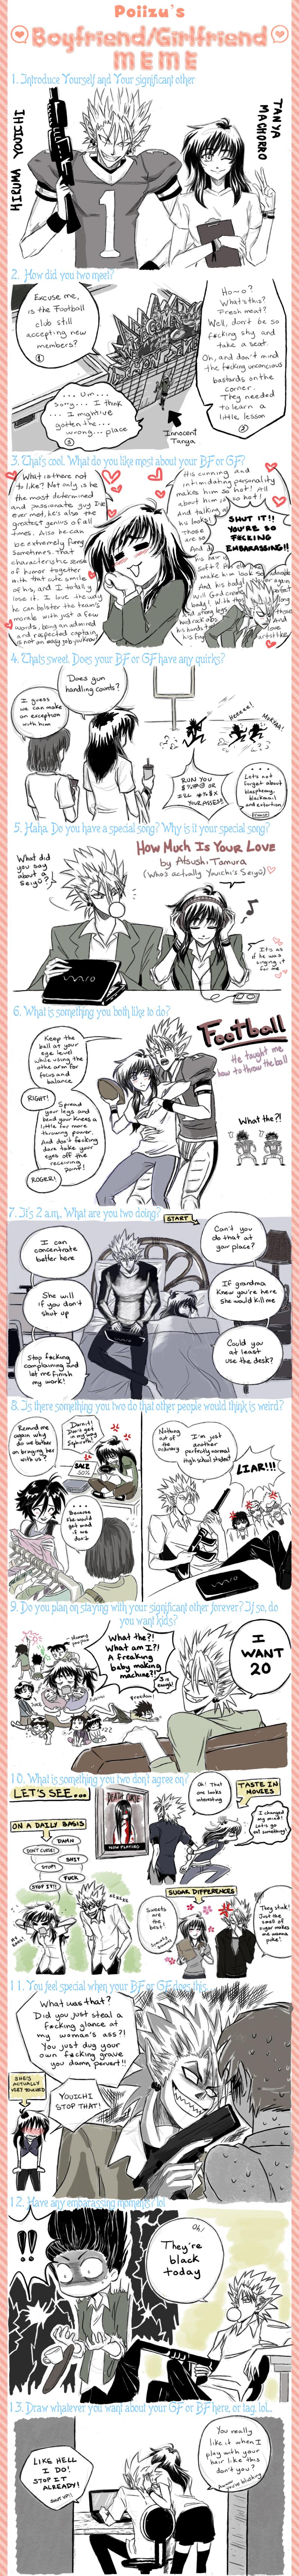 Hiruma Boyfriend Meme by Chibimanager